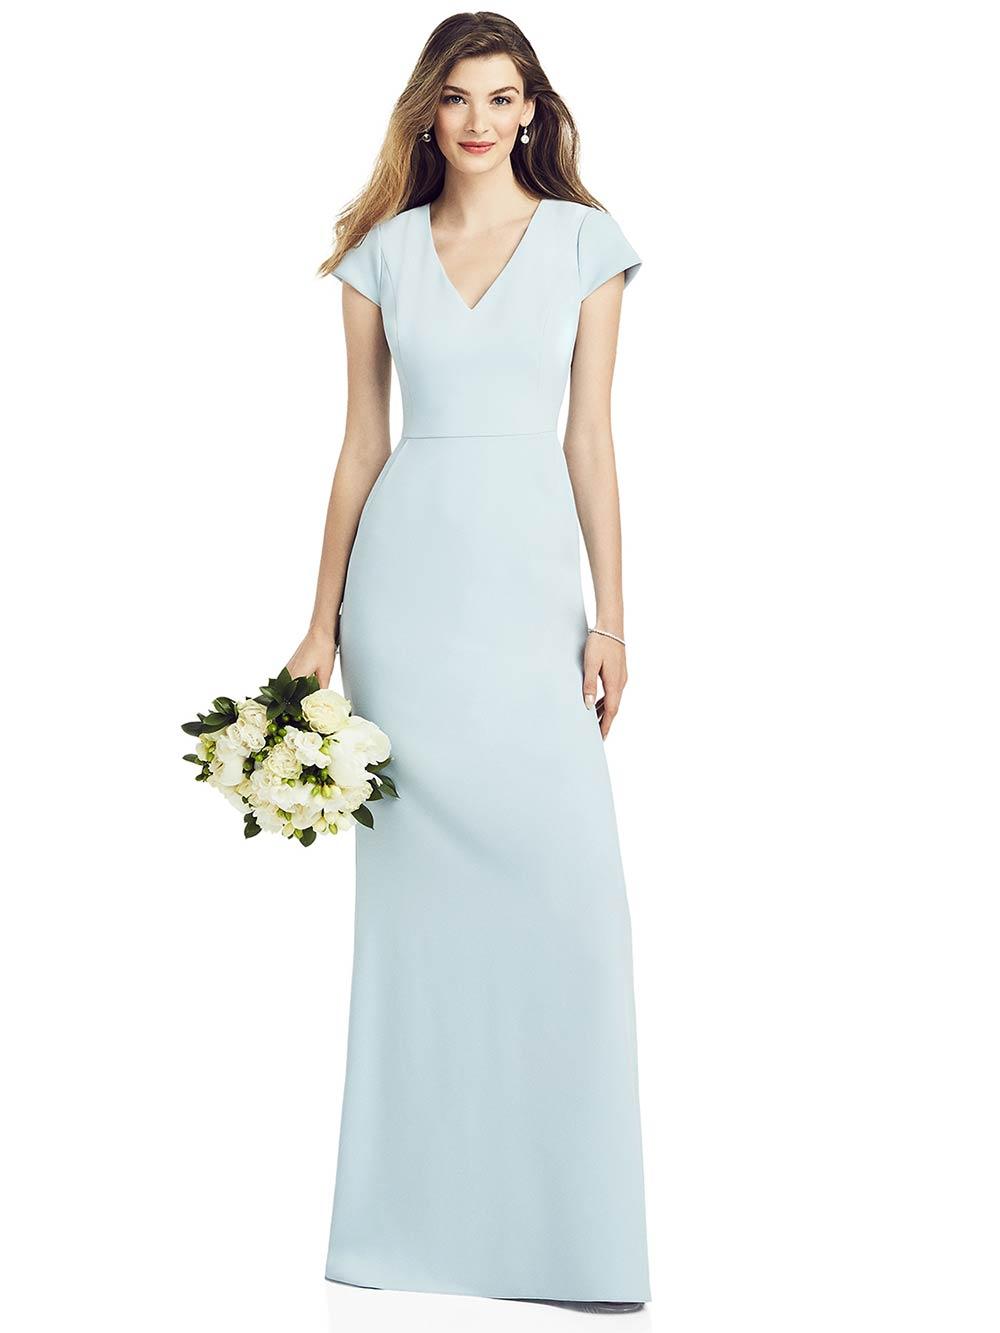 bridesmaid-dresses-dessy-28026